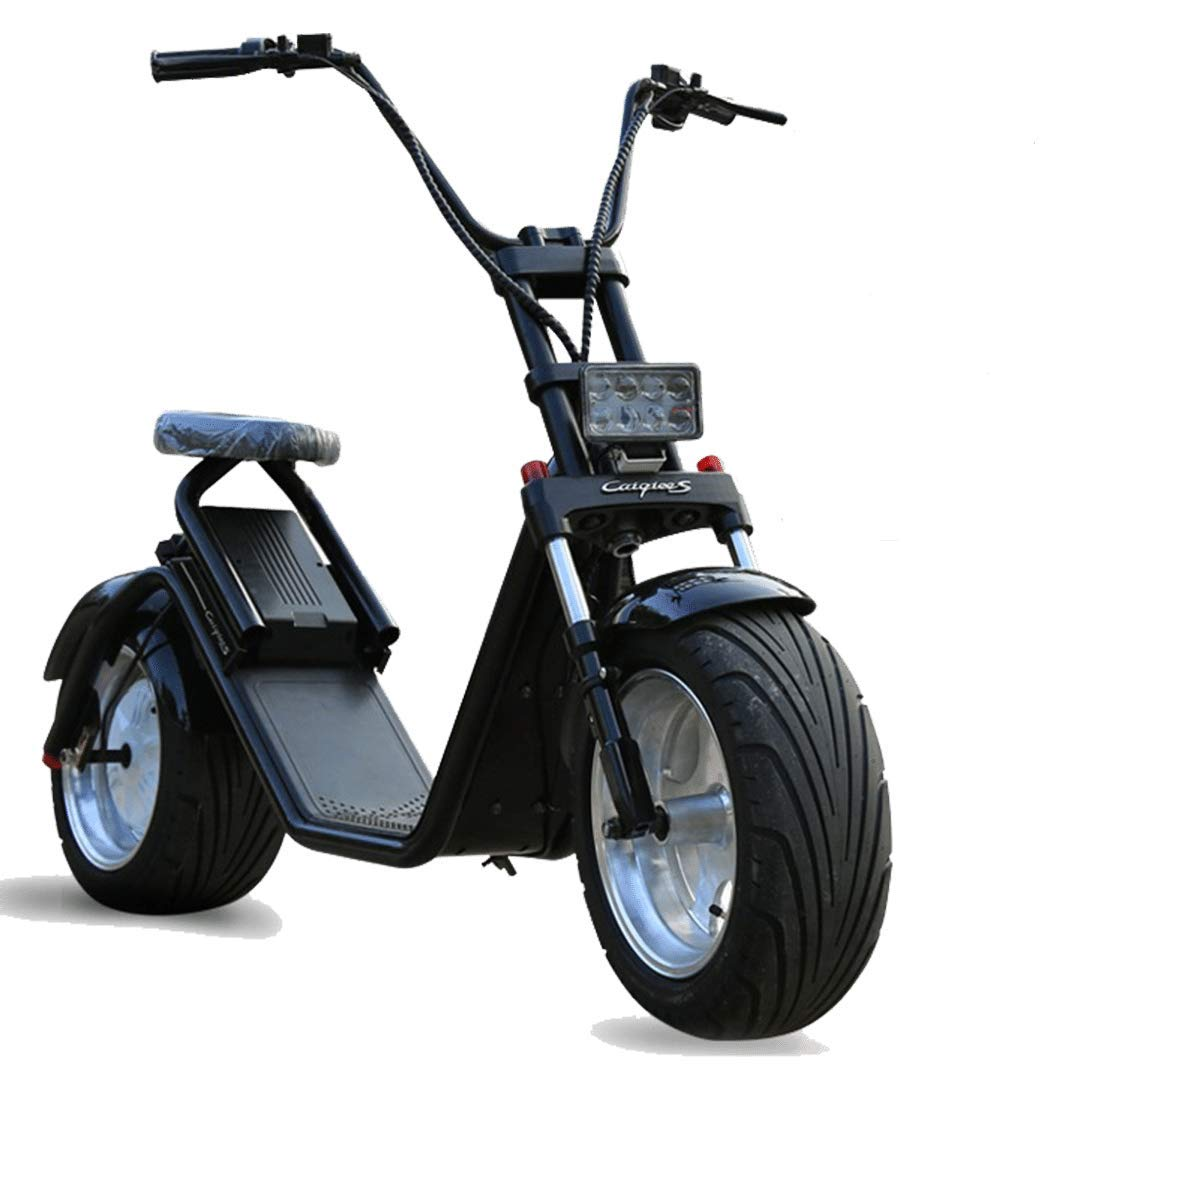 ECOXTREM Moto electrica Scooter de 1200w bateria 60v 12Ah Caigiee Patinete Bici Chopper City Coco